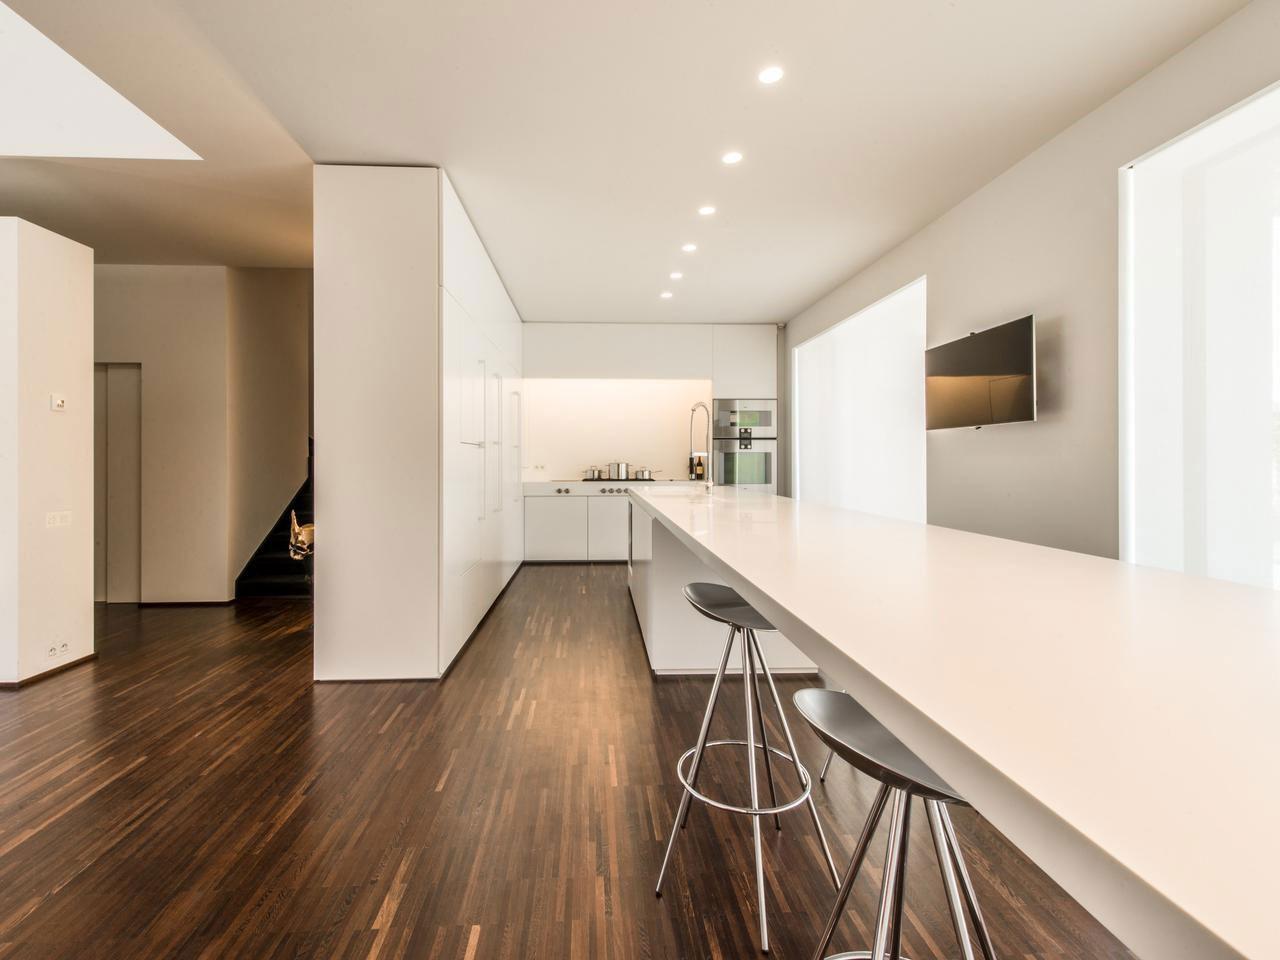 Best type of laminate flooring for kitchen